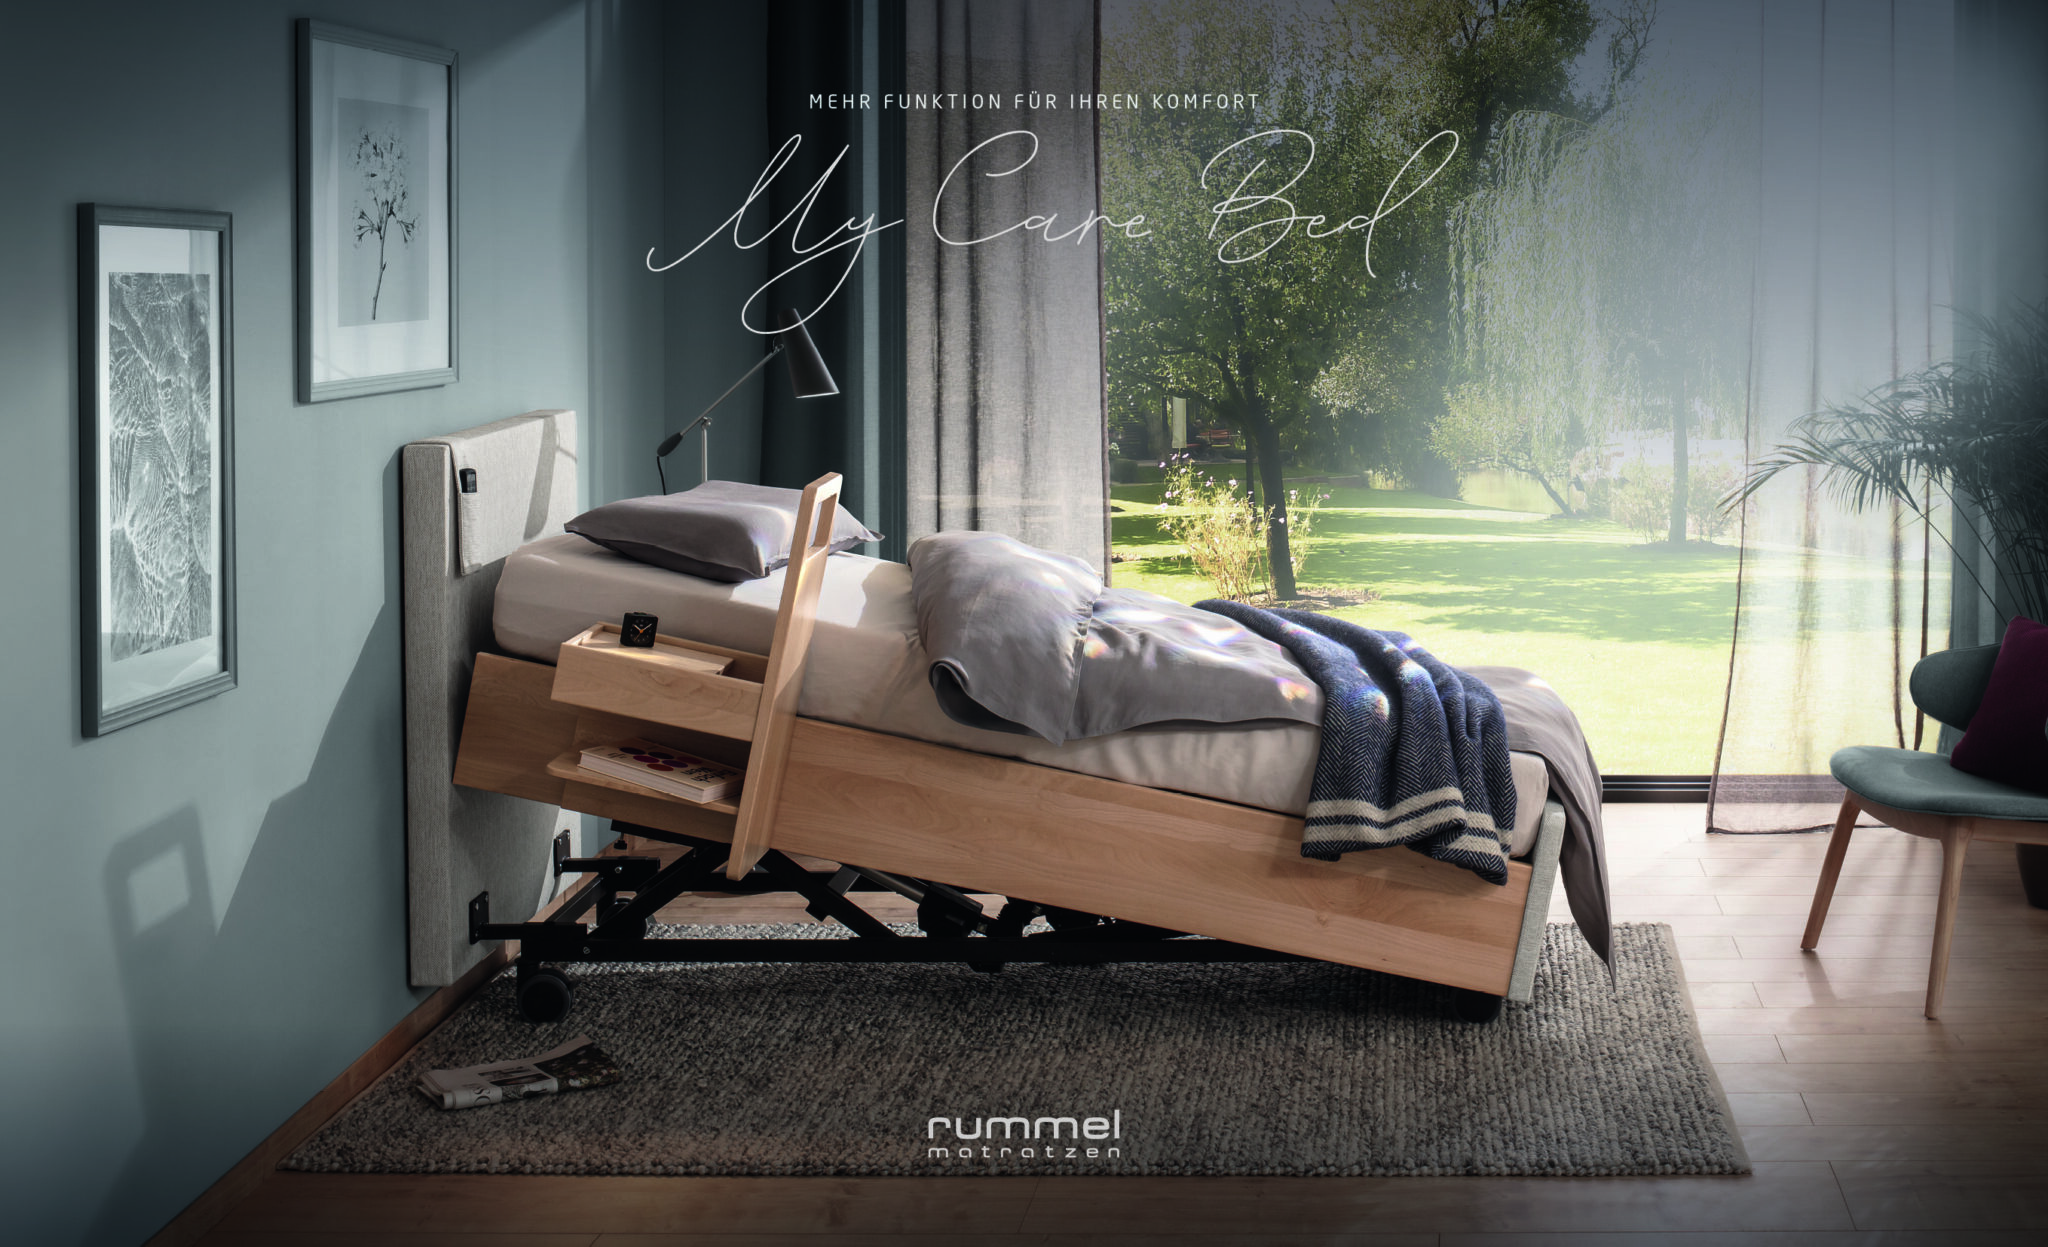 Rummel MY CARE BED Seniorenbett